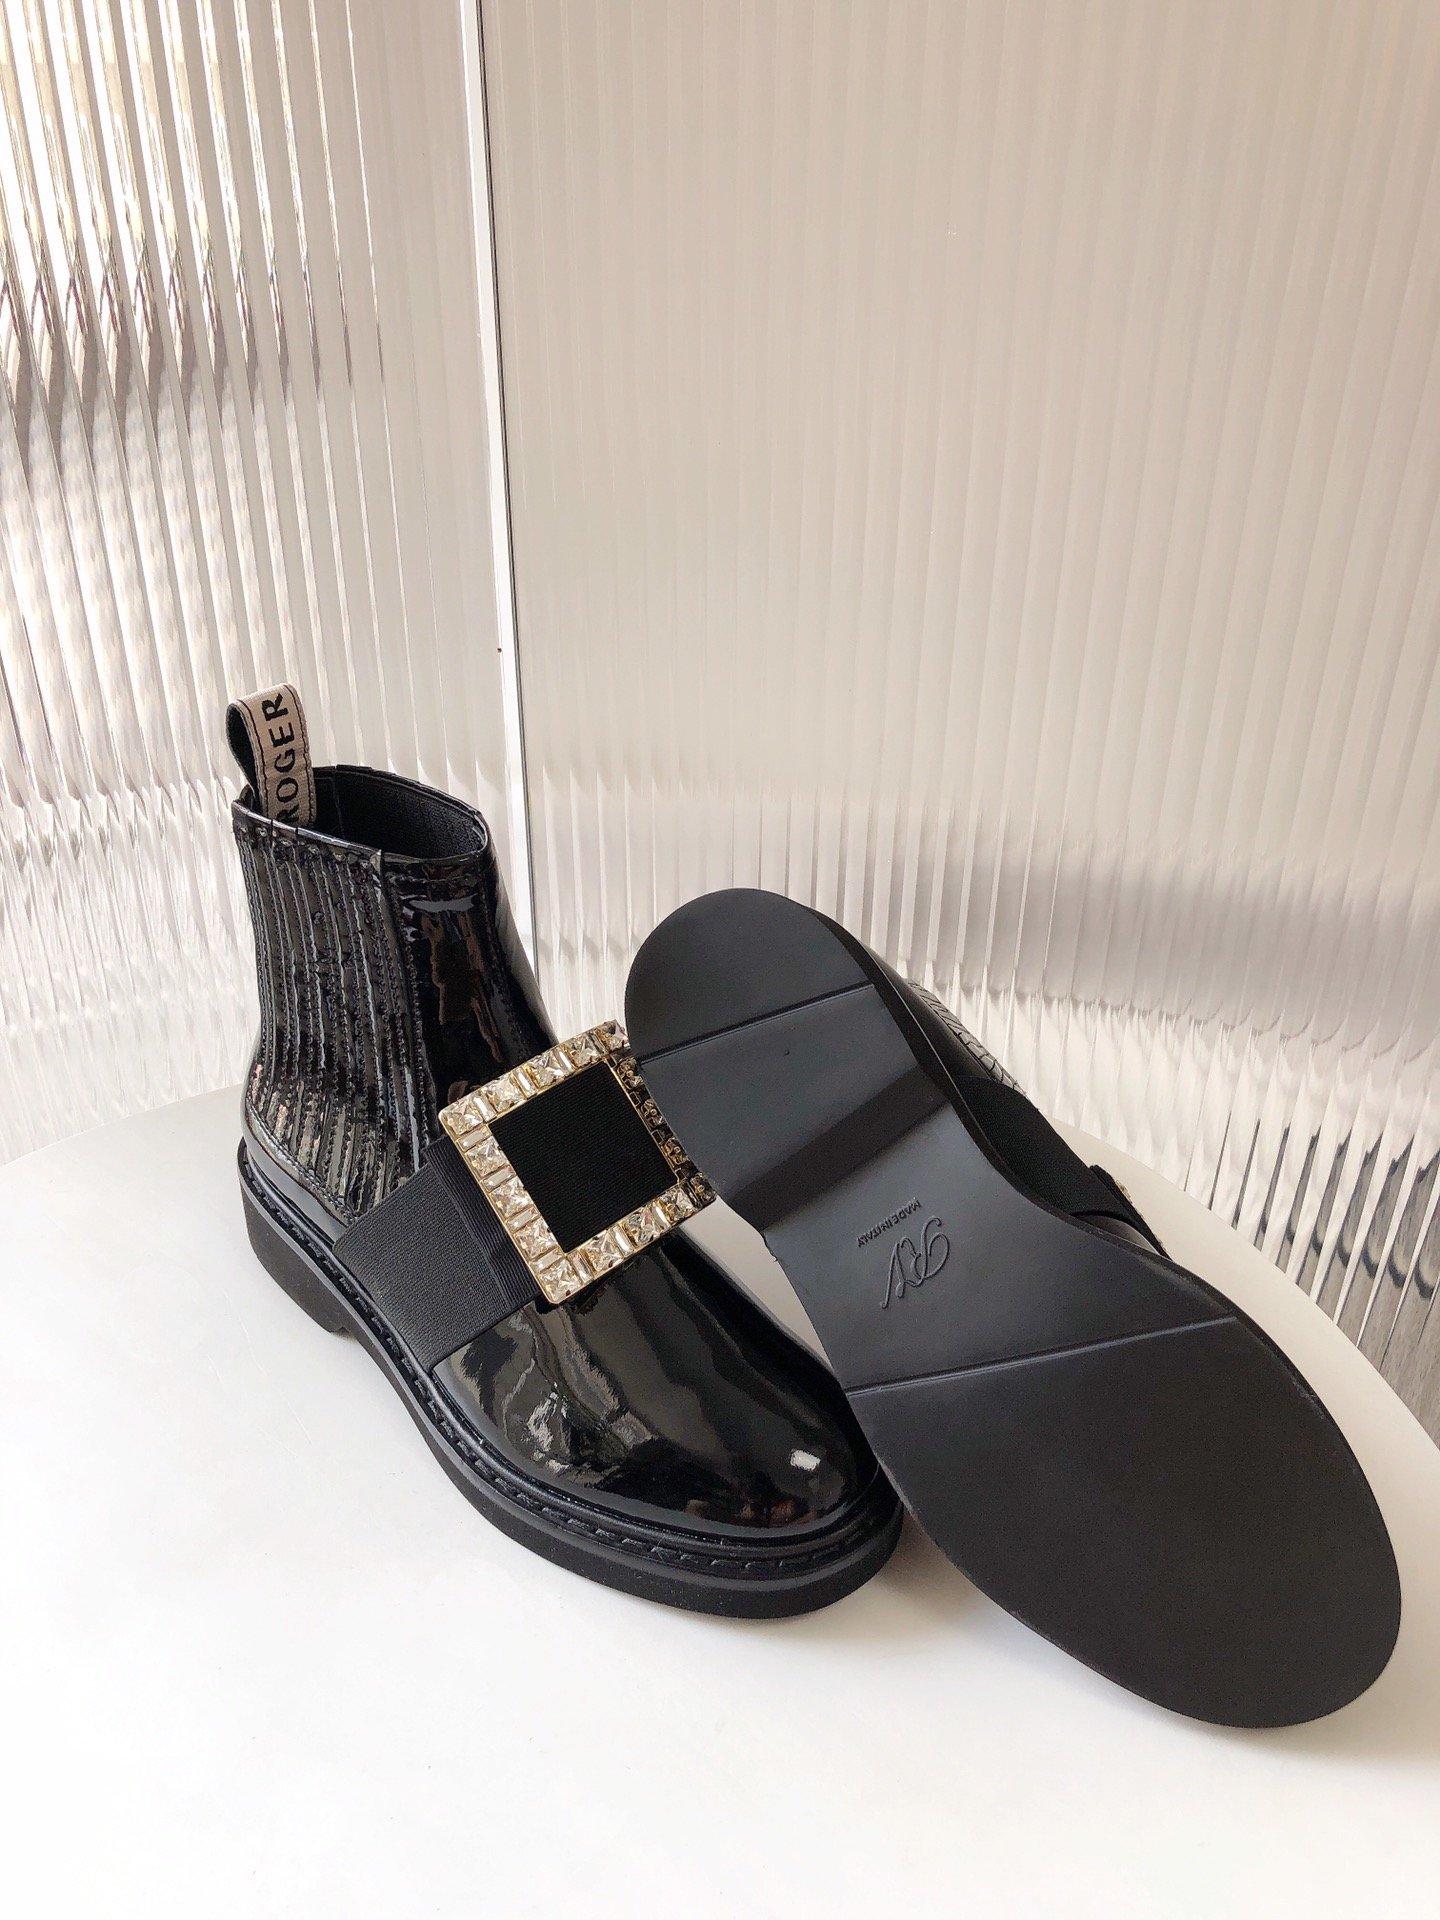 Roger Vivier 切尔西短靴 钻扣/钻扣(图7)